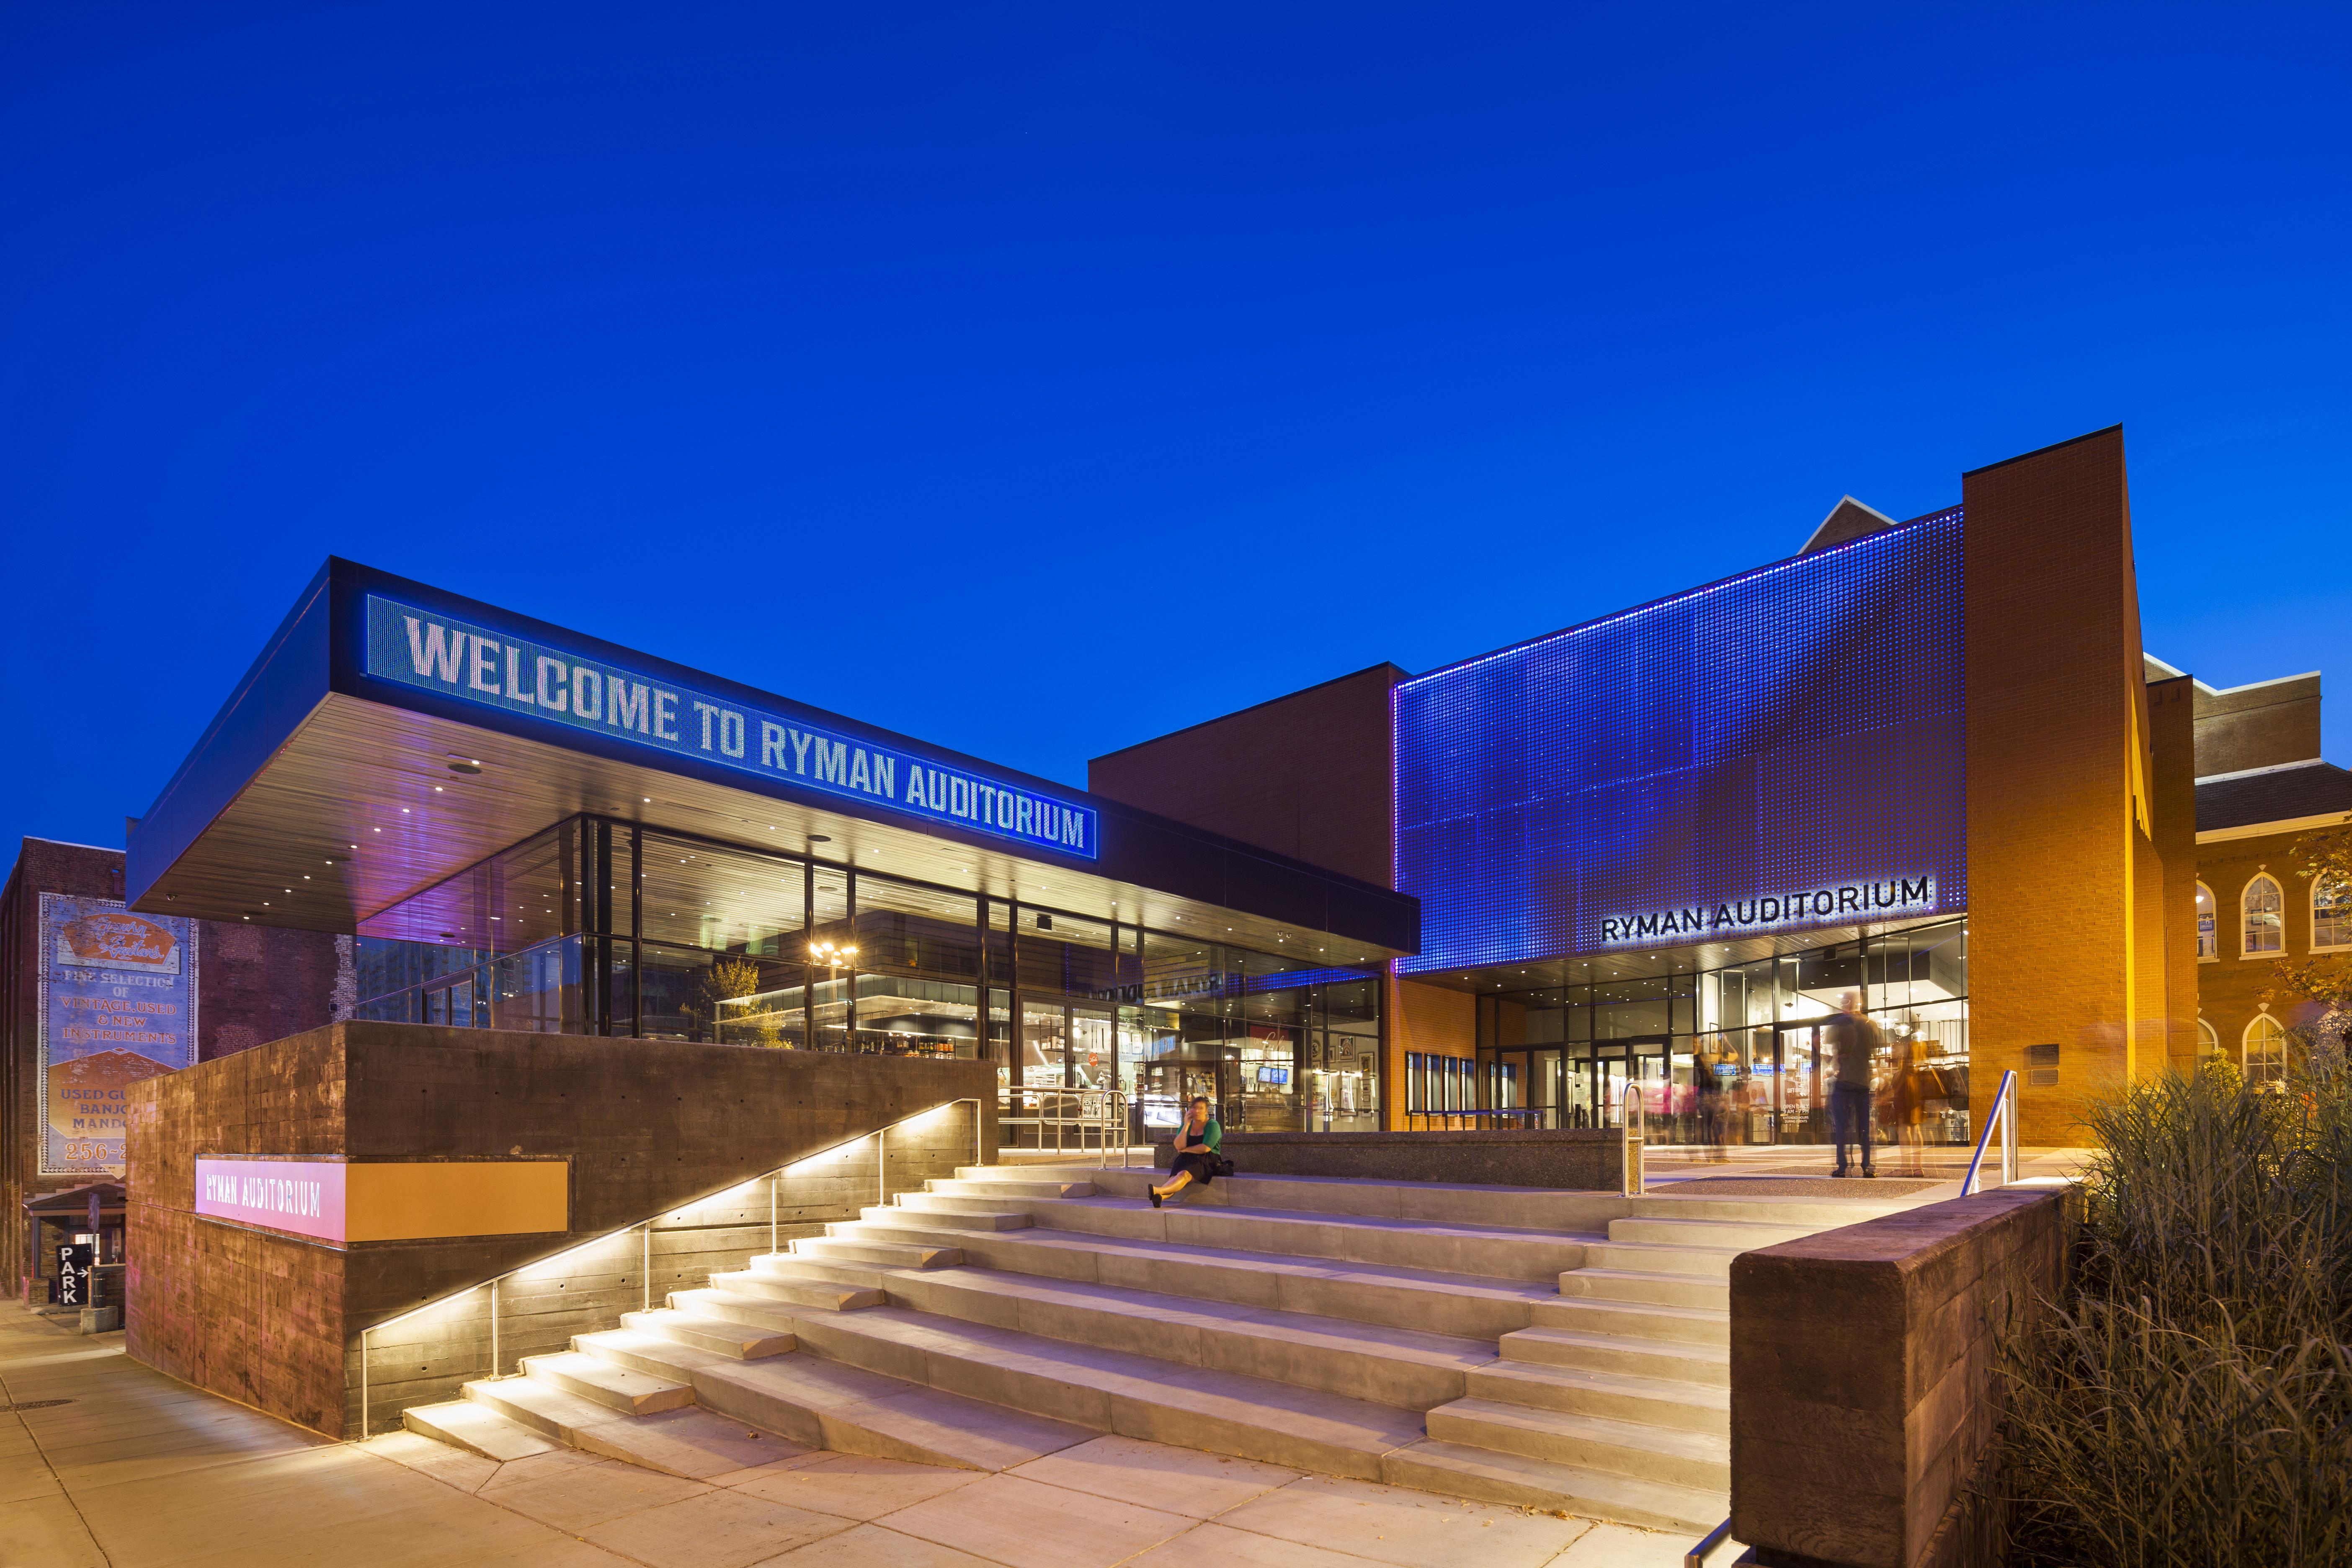 the ryman auditorium renovation and expansion